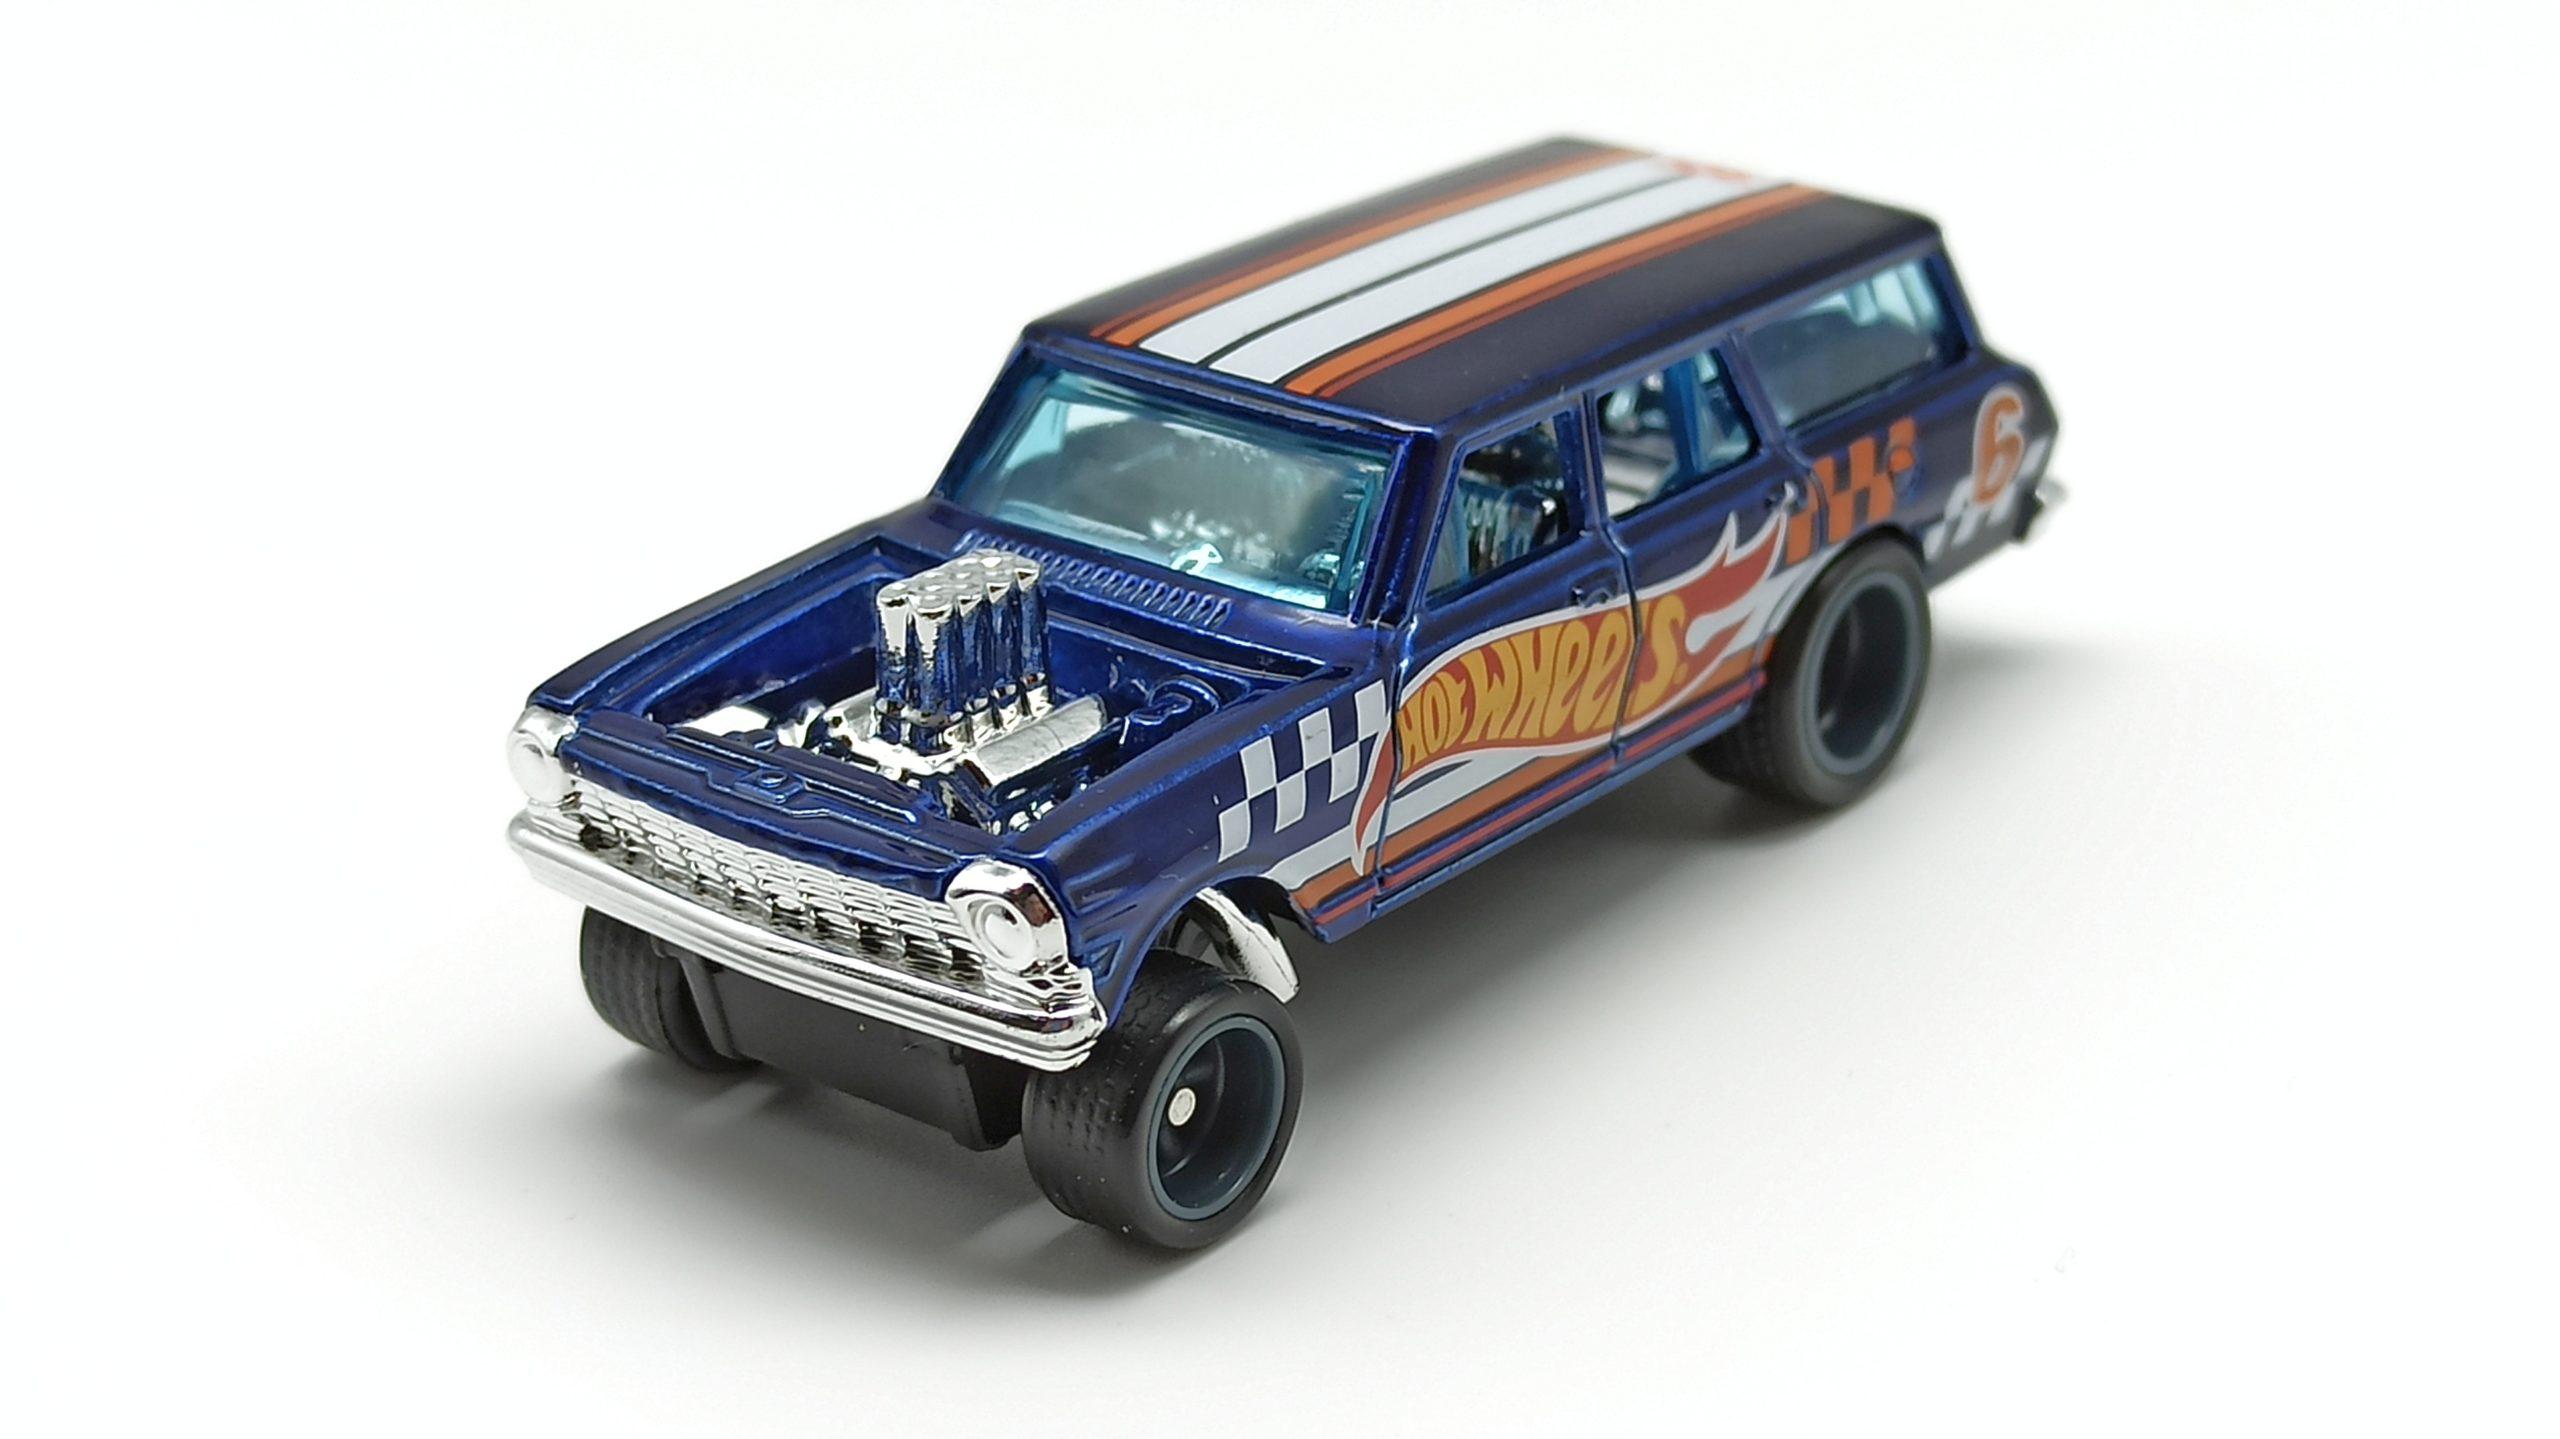 Hot Wheels '64 Chevy Nova Wagon Gasser (GTD06) 2021 (232/250) HW Race Team (7/10) spectraflame blue Super Treasure Hunt (STH) top angle